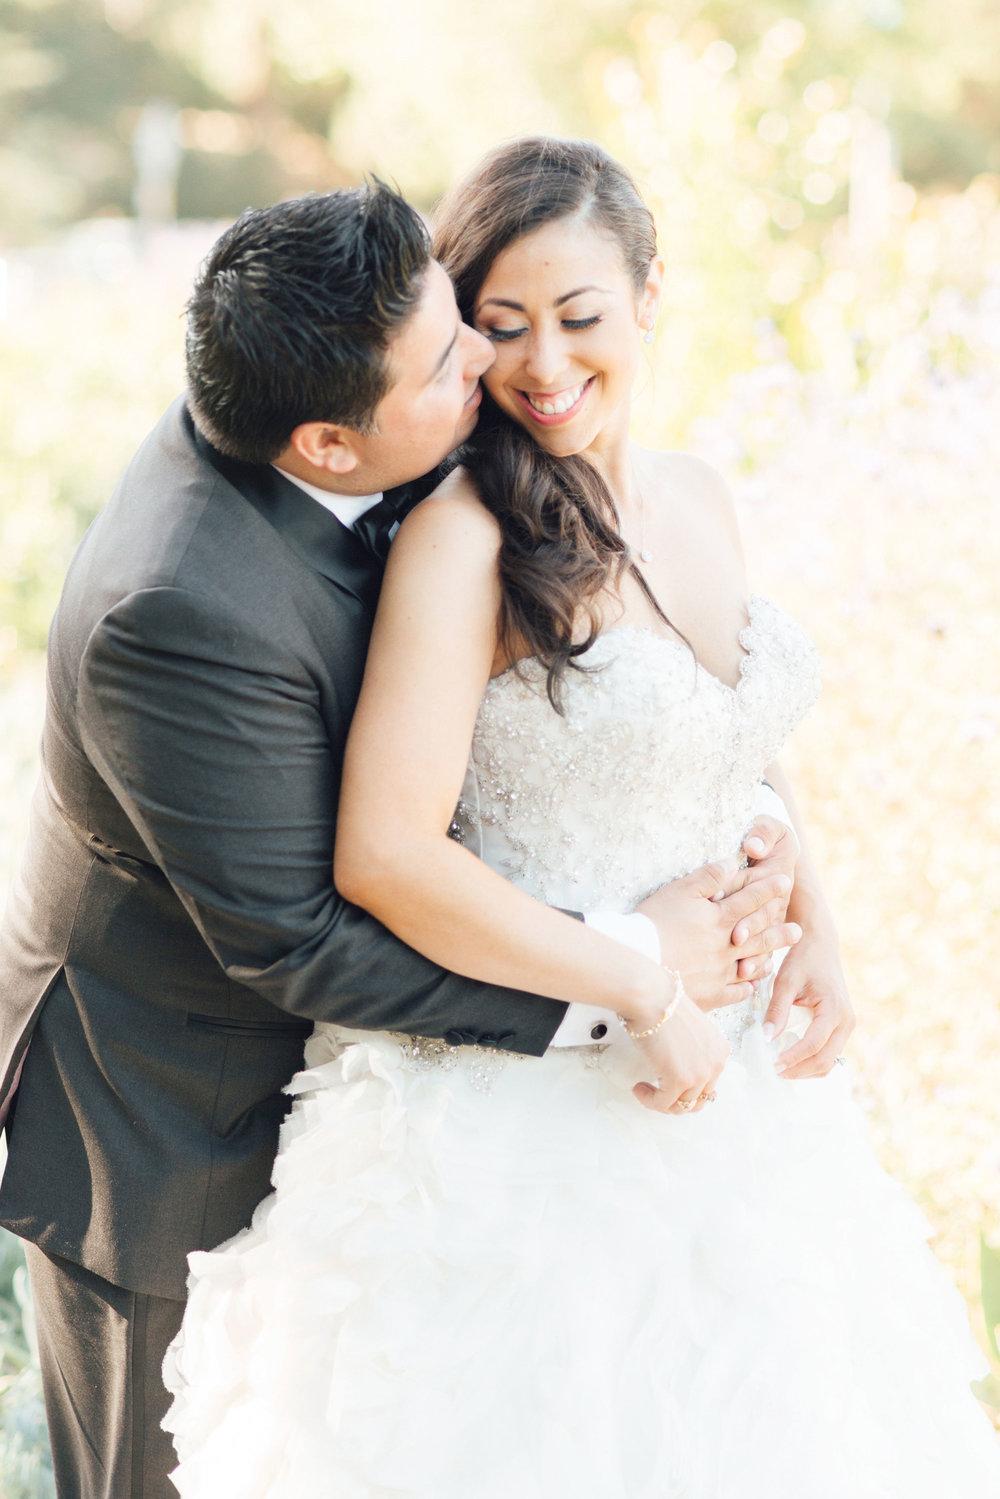 kat-oscar-wedding-463-copy.jpg